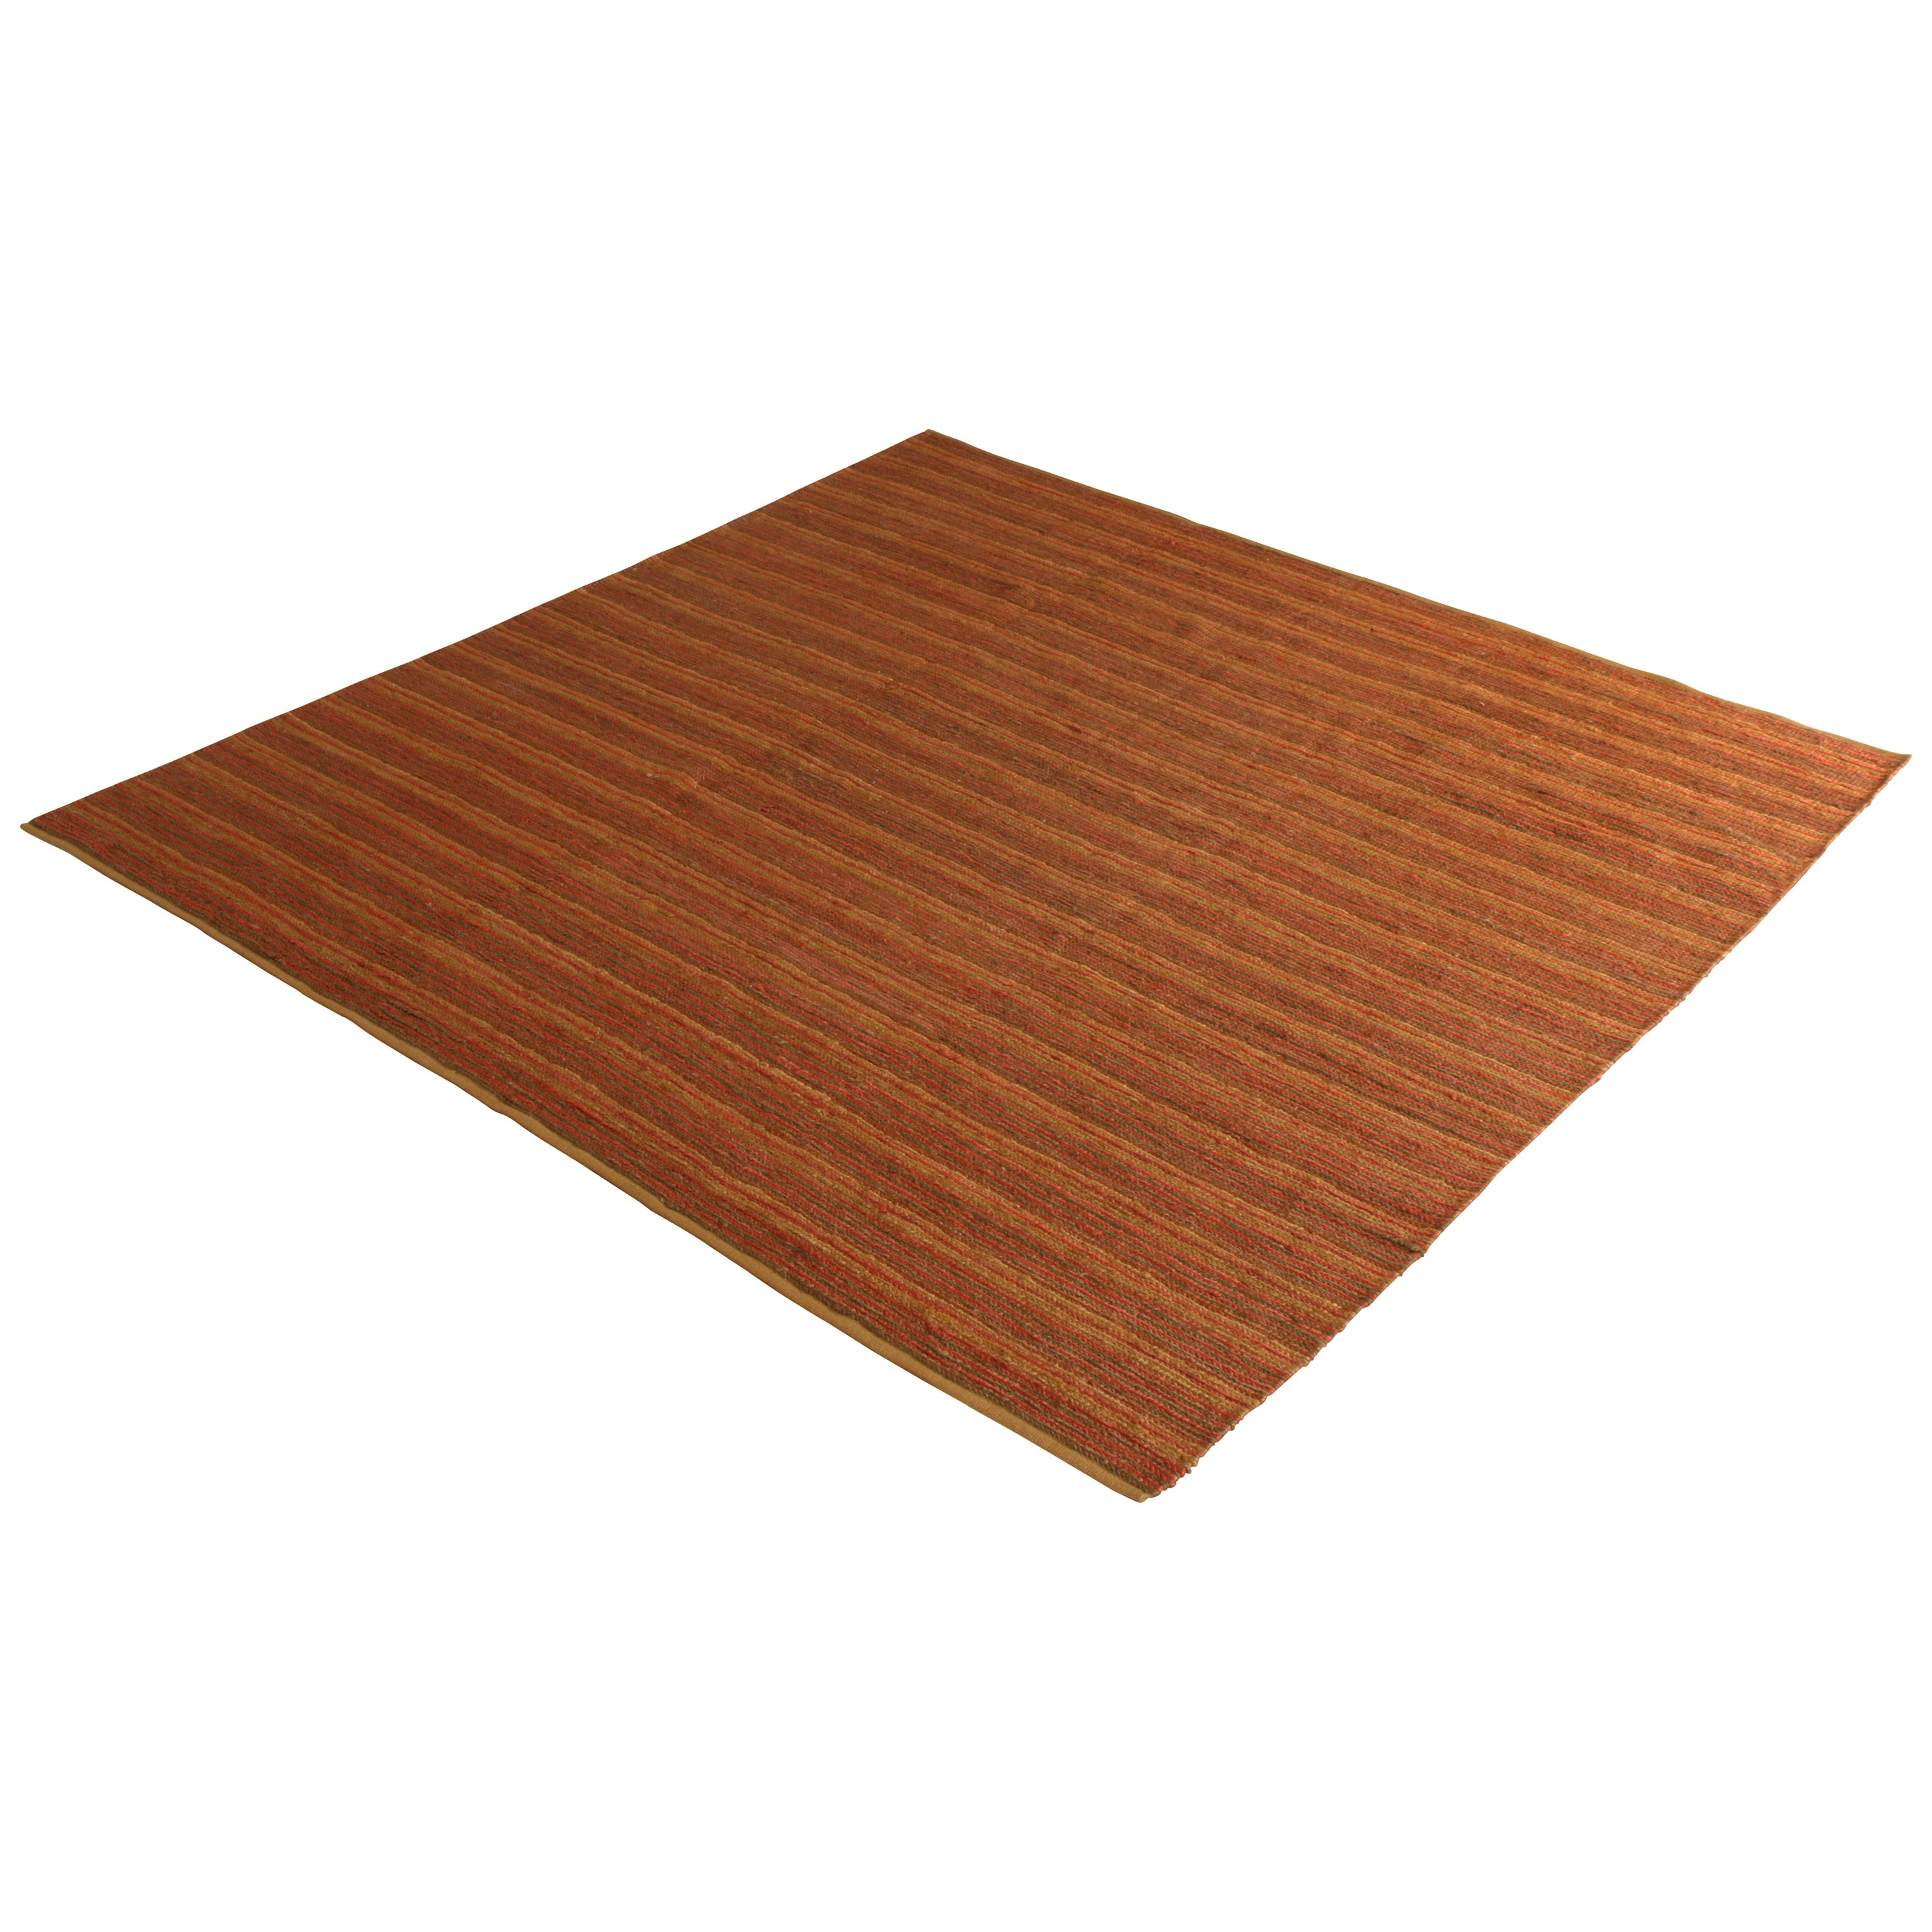 Contemporary Flat-Weave Striped Orange Brown Square Kilim by Rug & Kilim